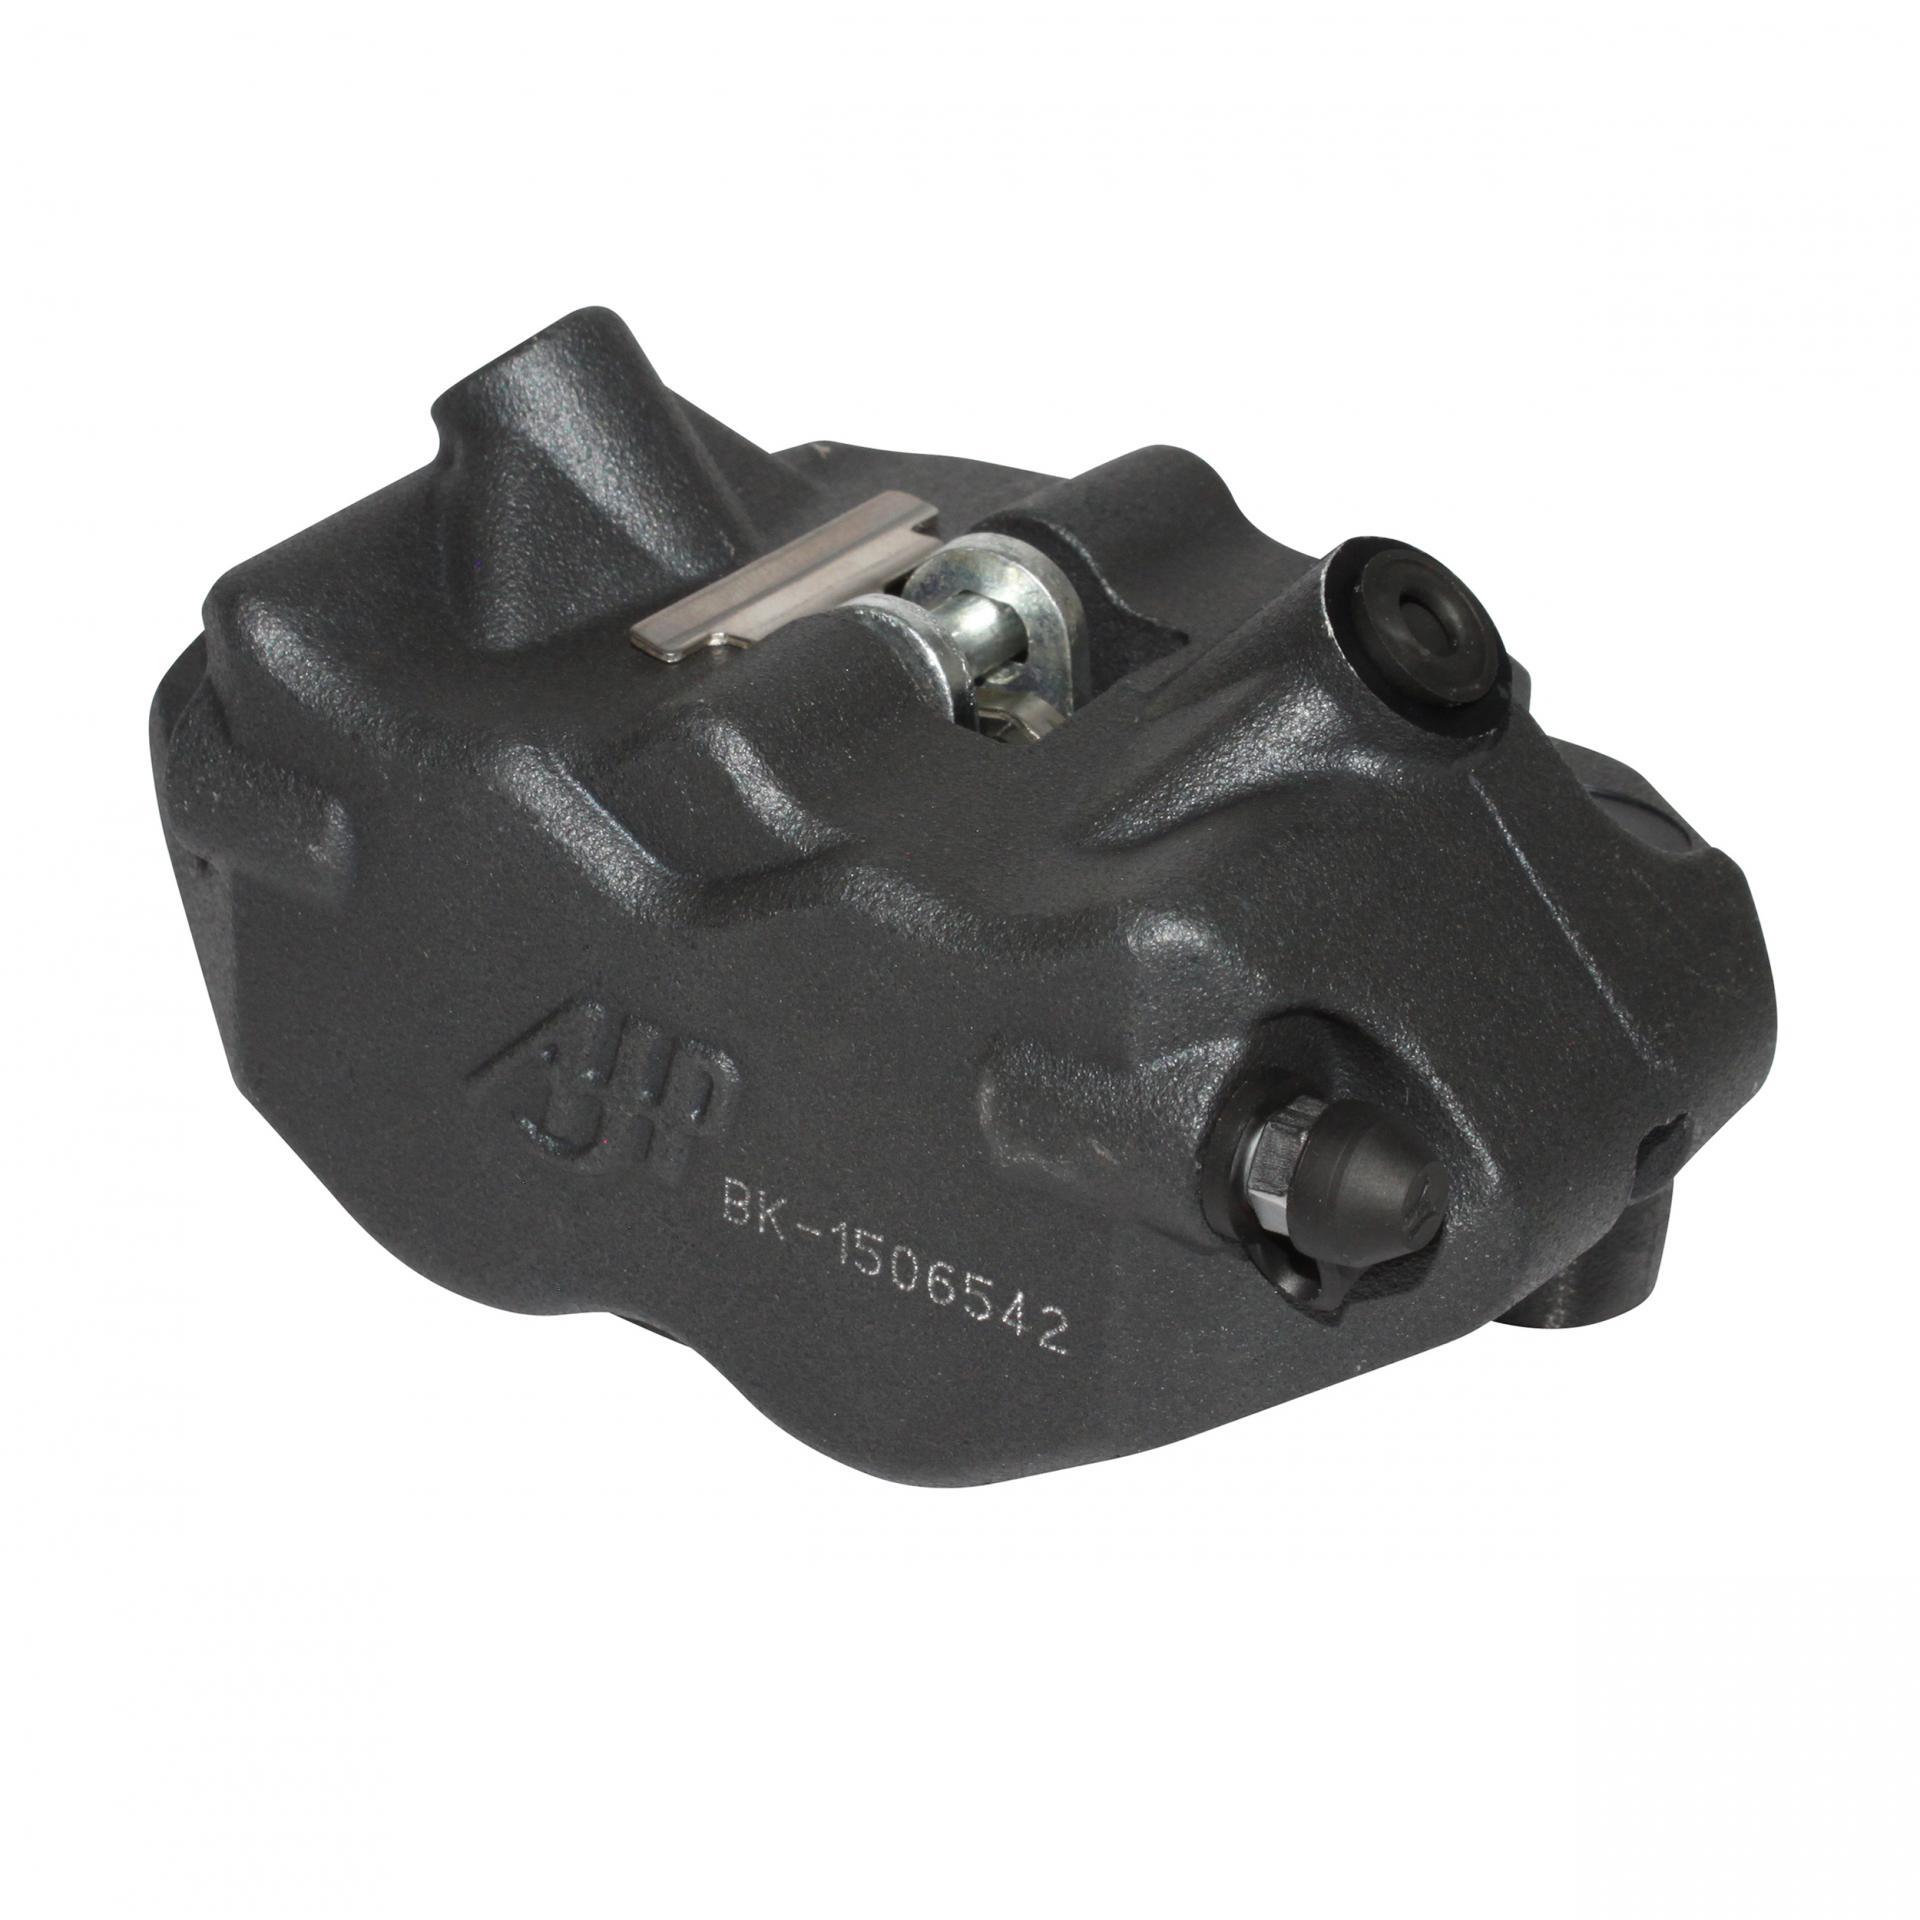 Étrier de frein avant AJP Derbi 50 GPR 04-08